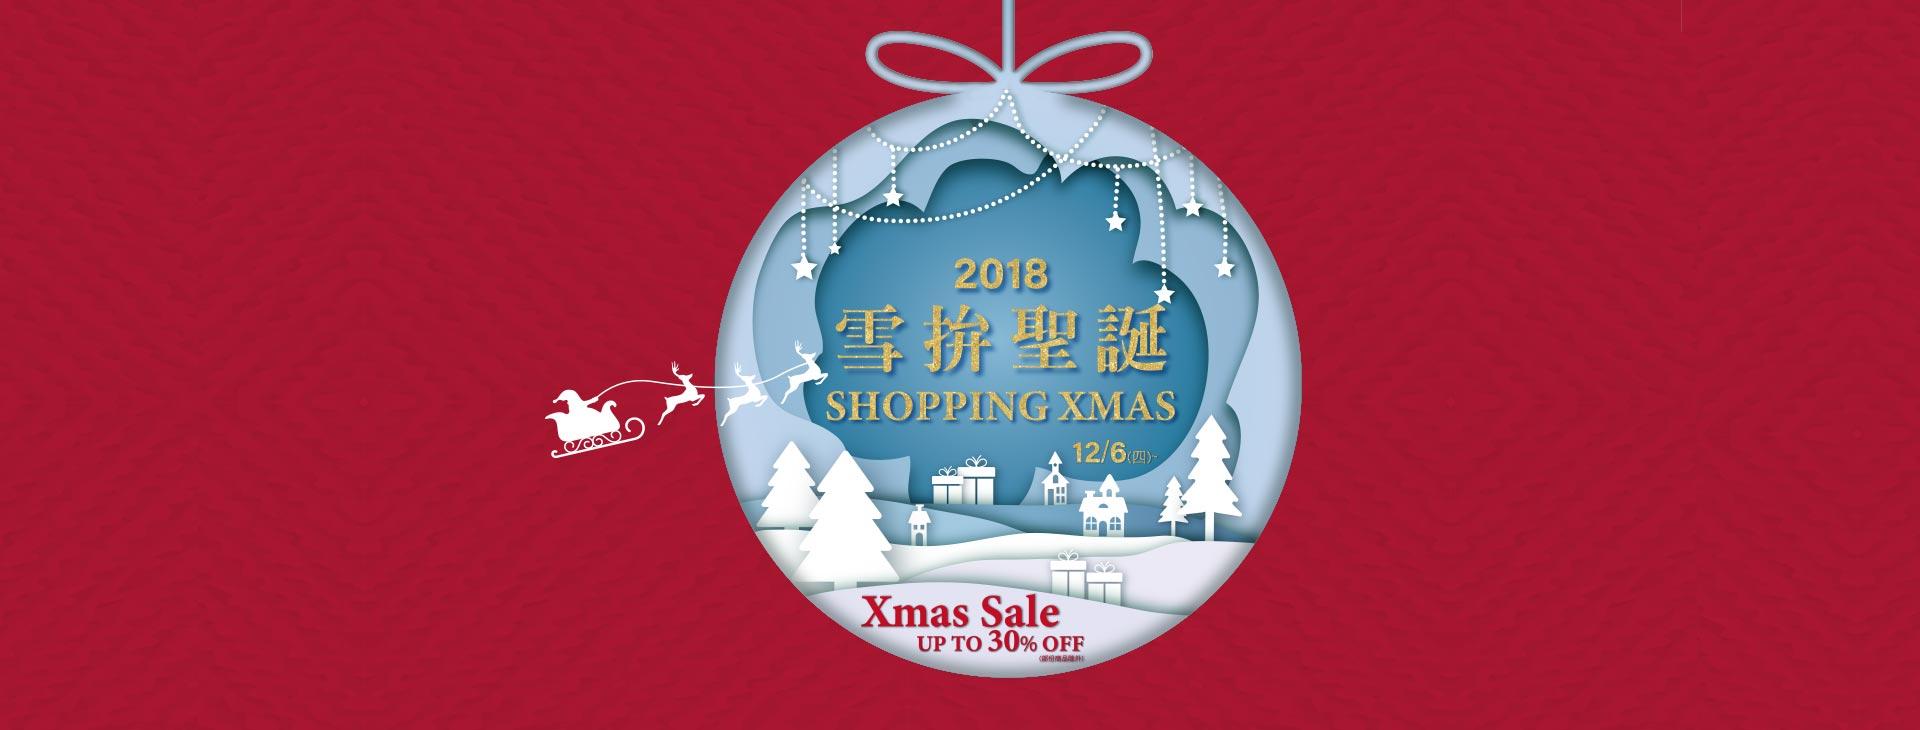 2018雪拚聖誕 SHOPPING XMAS